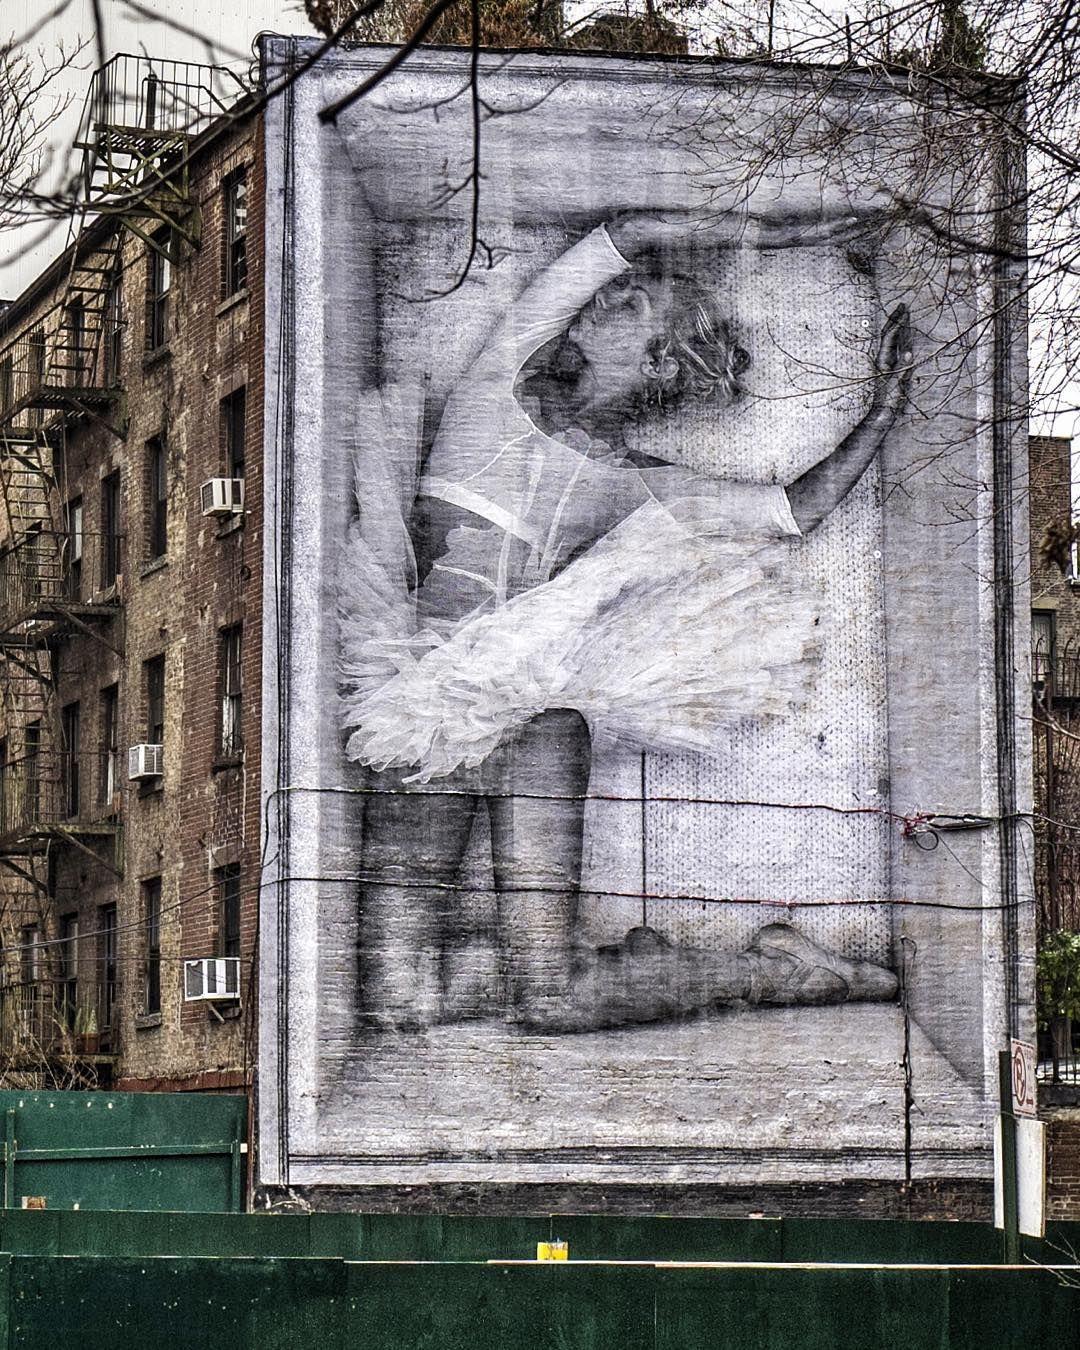 New York City. (2nd Avenue and 1 street) CharlotteRanson